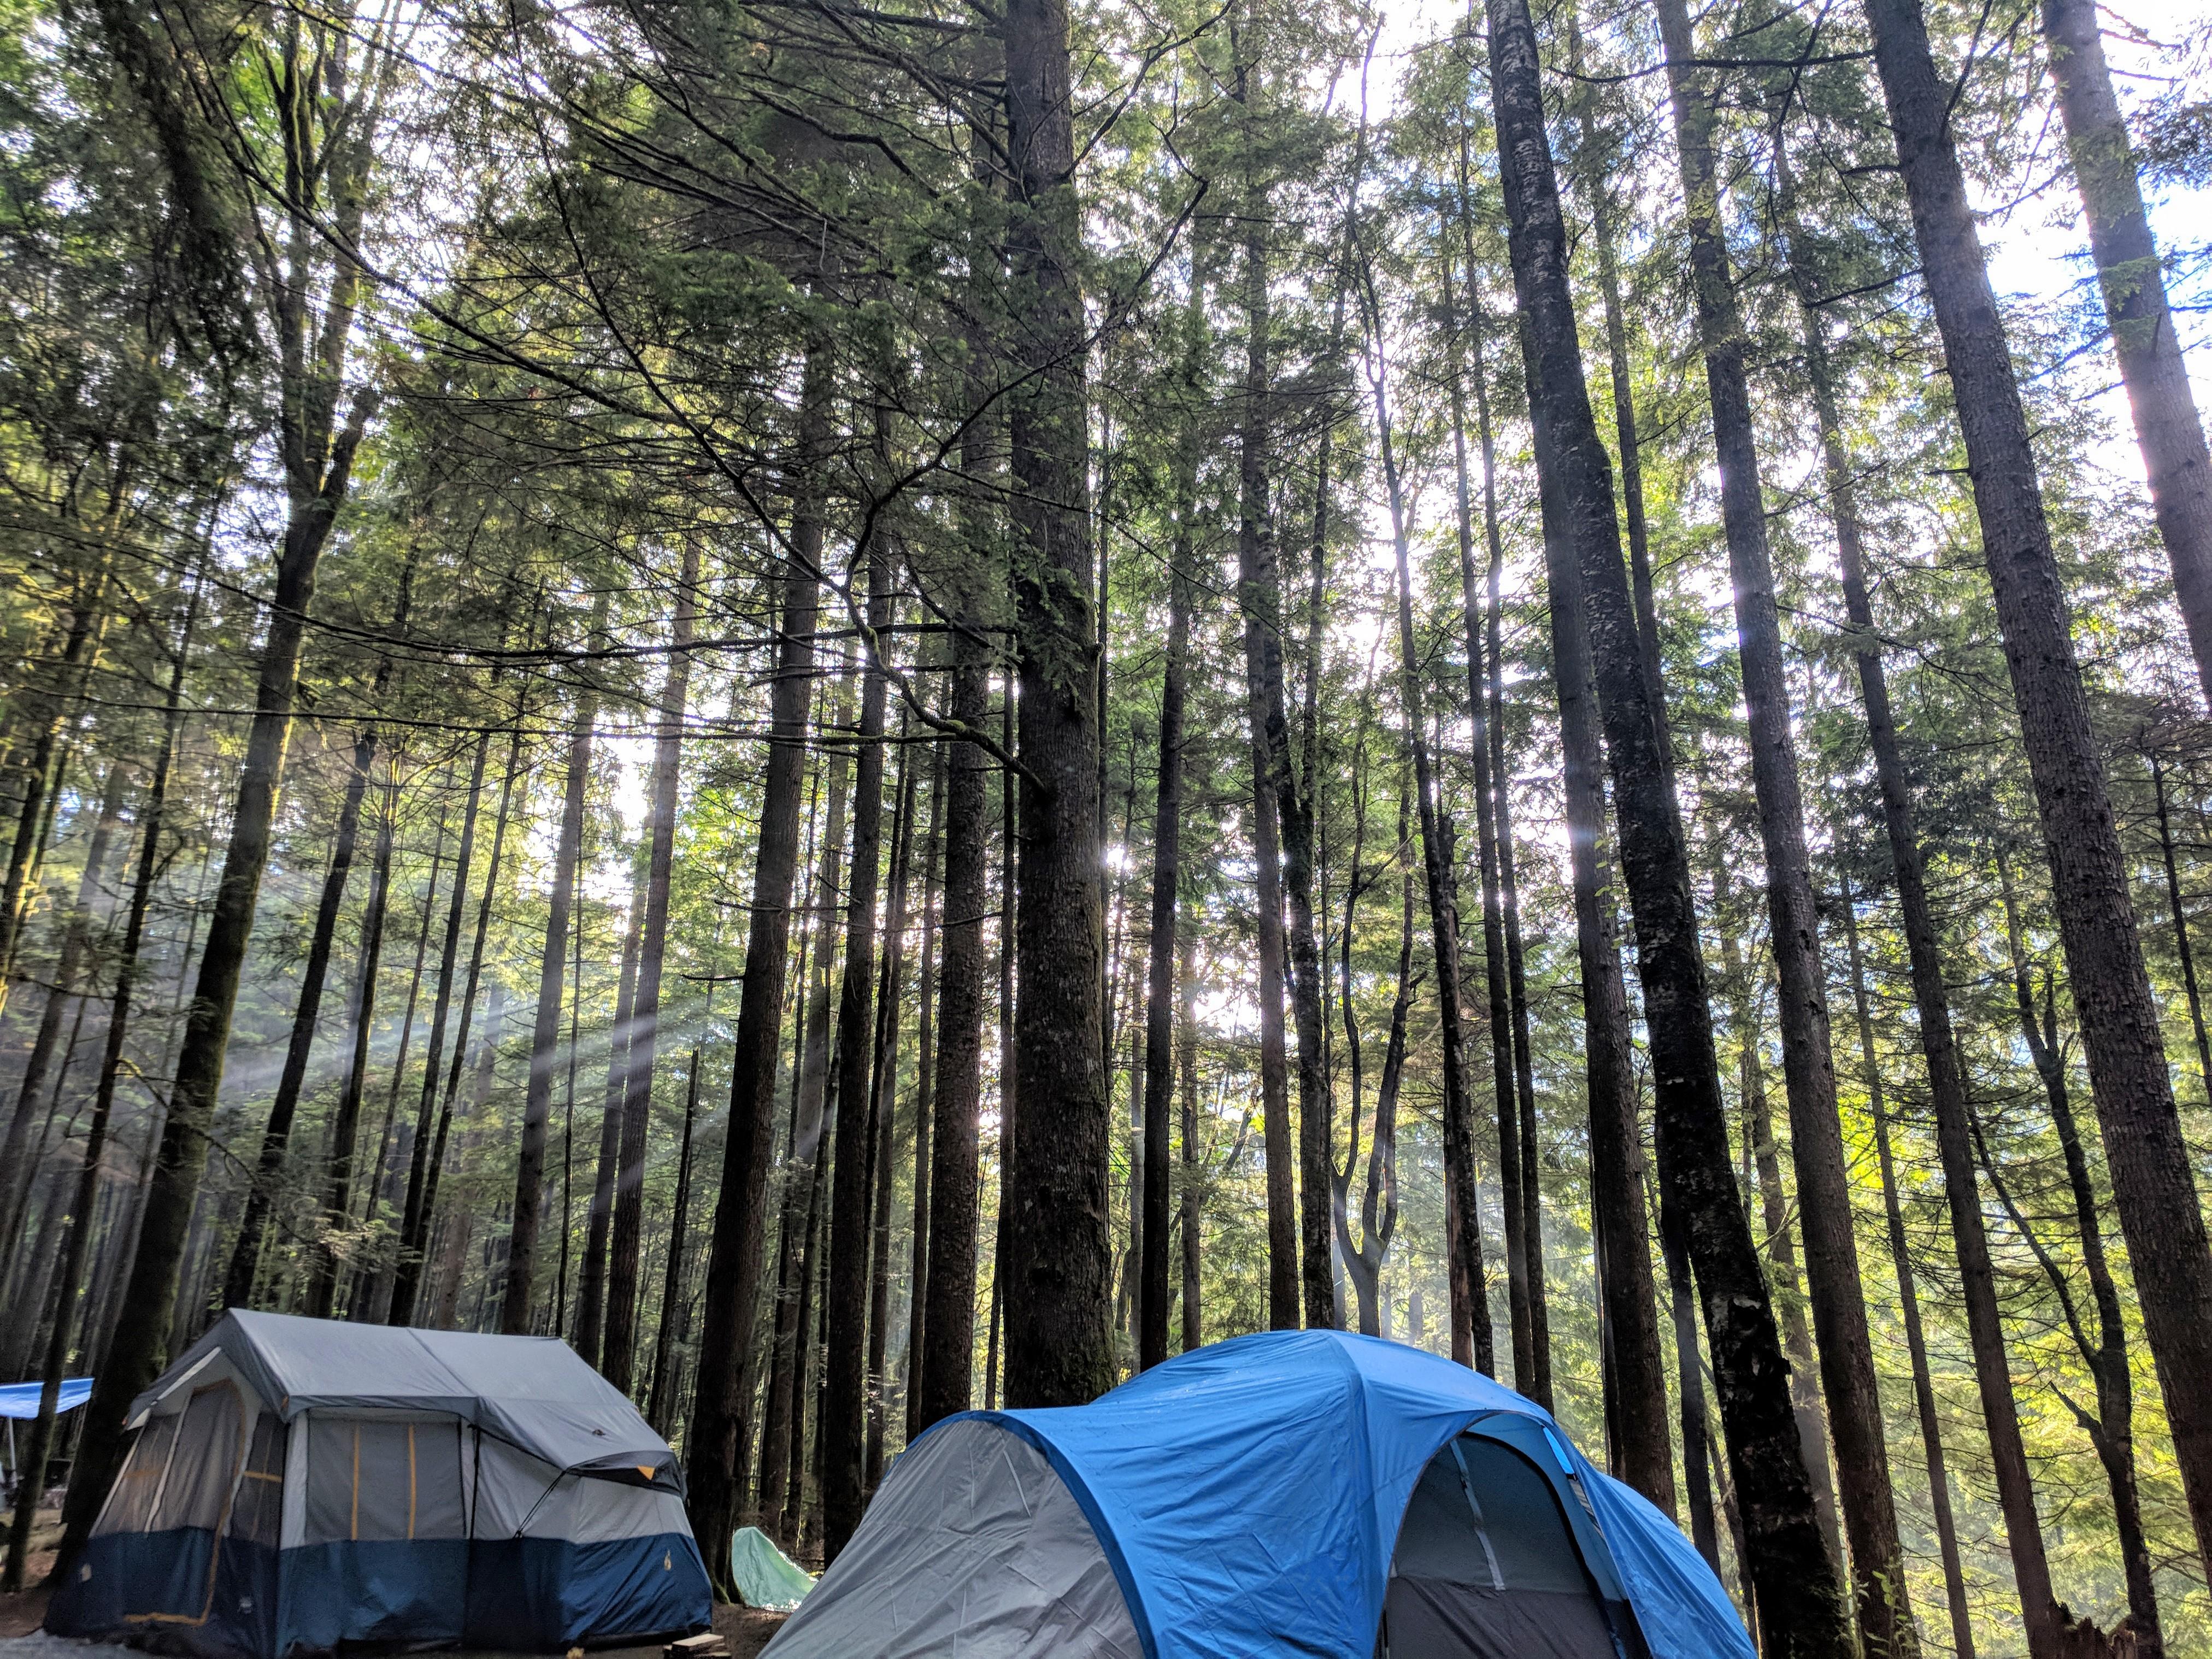 Camping Season is here (?!)